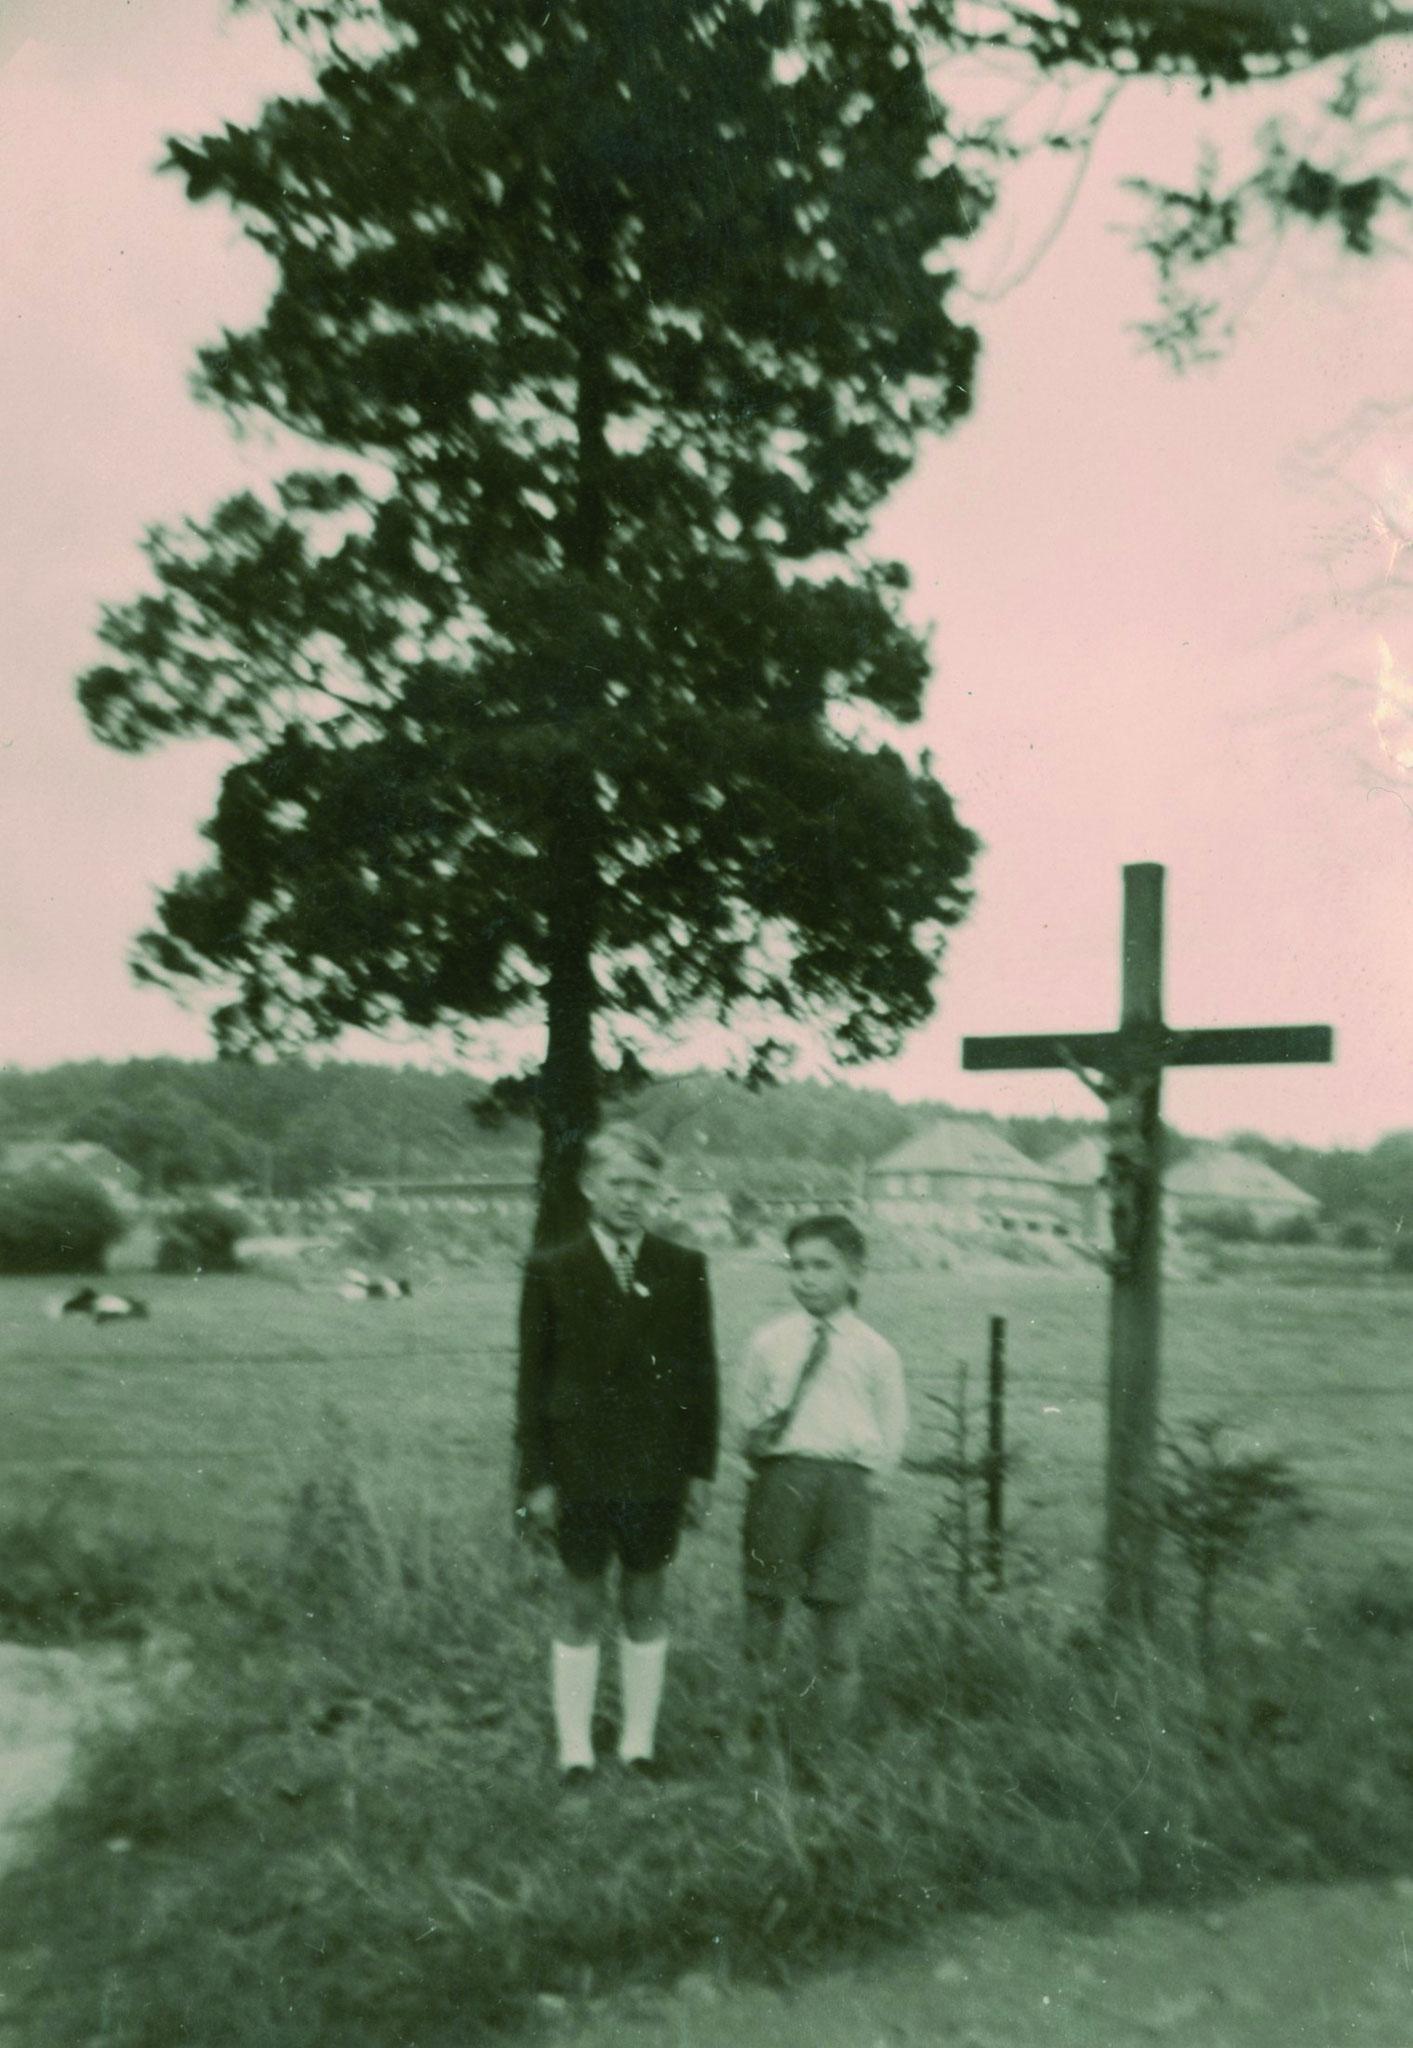 Mit Reinhard Kleebank an der Kaiserallee 1957